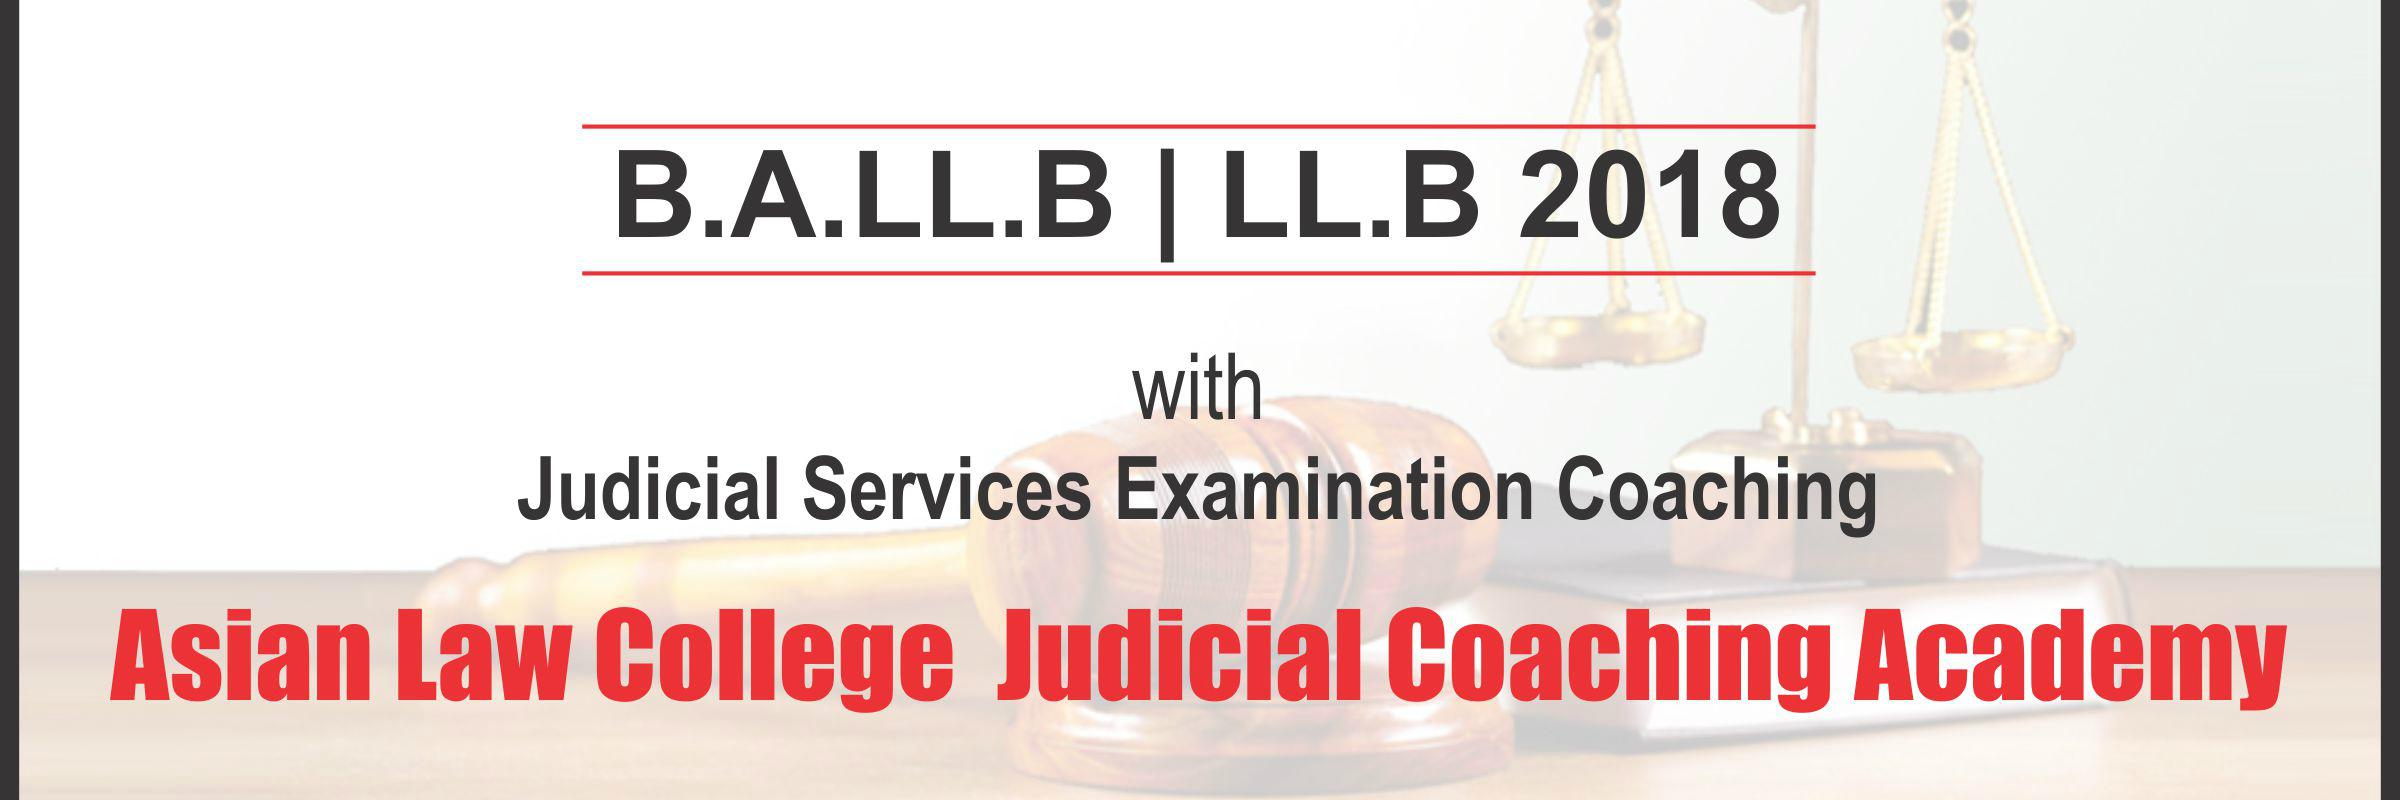 Asian Law College Judicial Coaching Academy for Judicial Service Examination